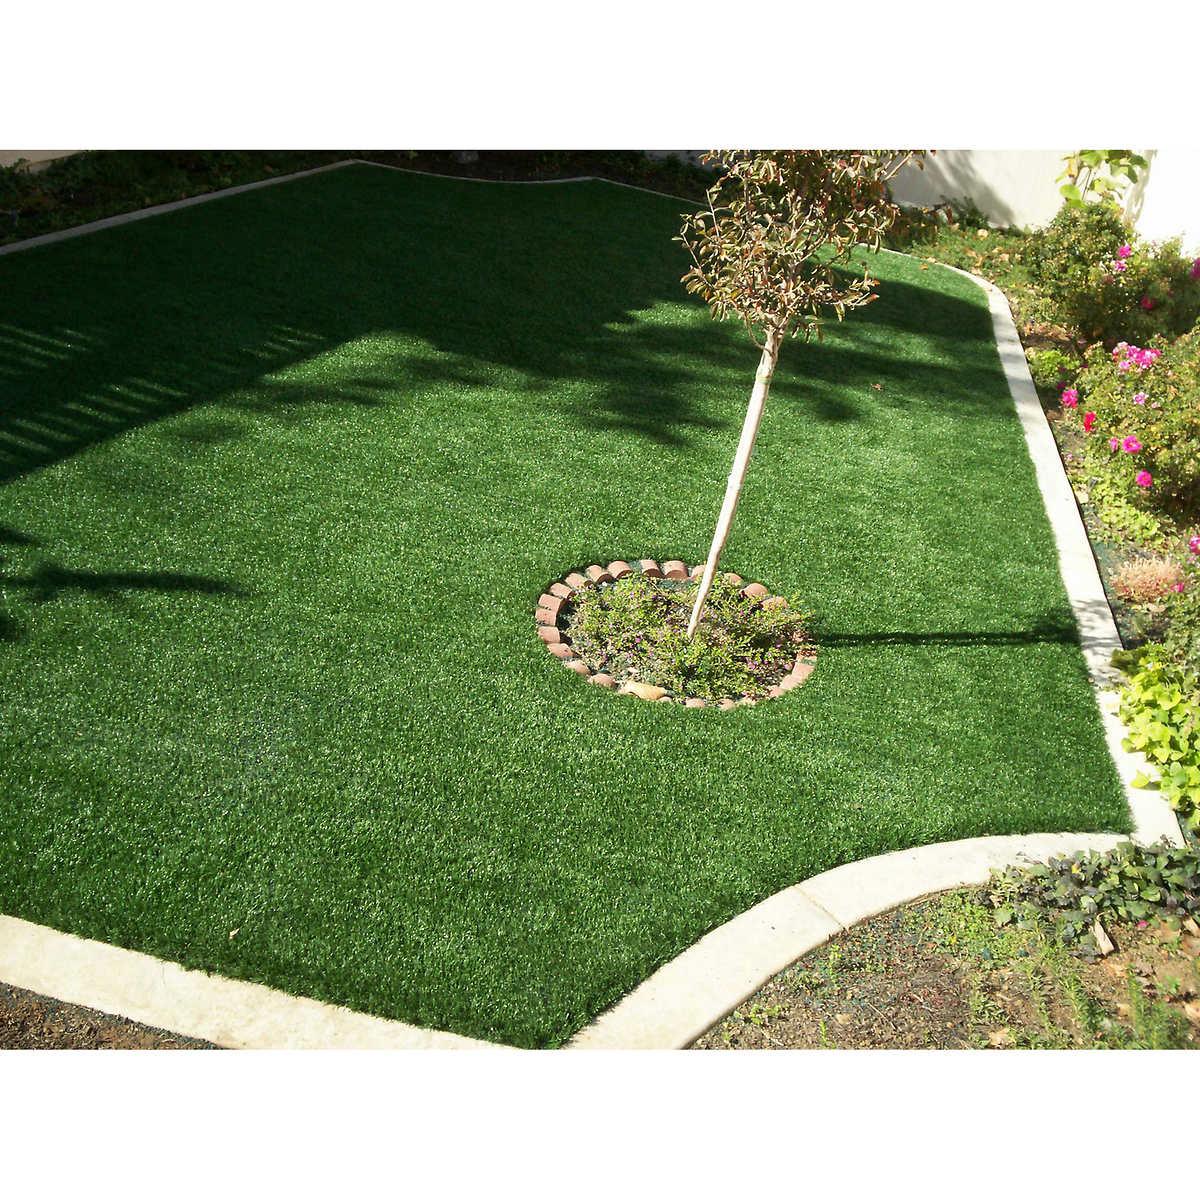 Astro Turf Garden >> Pregra Bermuda Artificial Turf